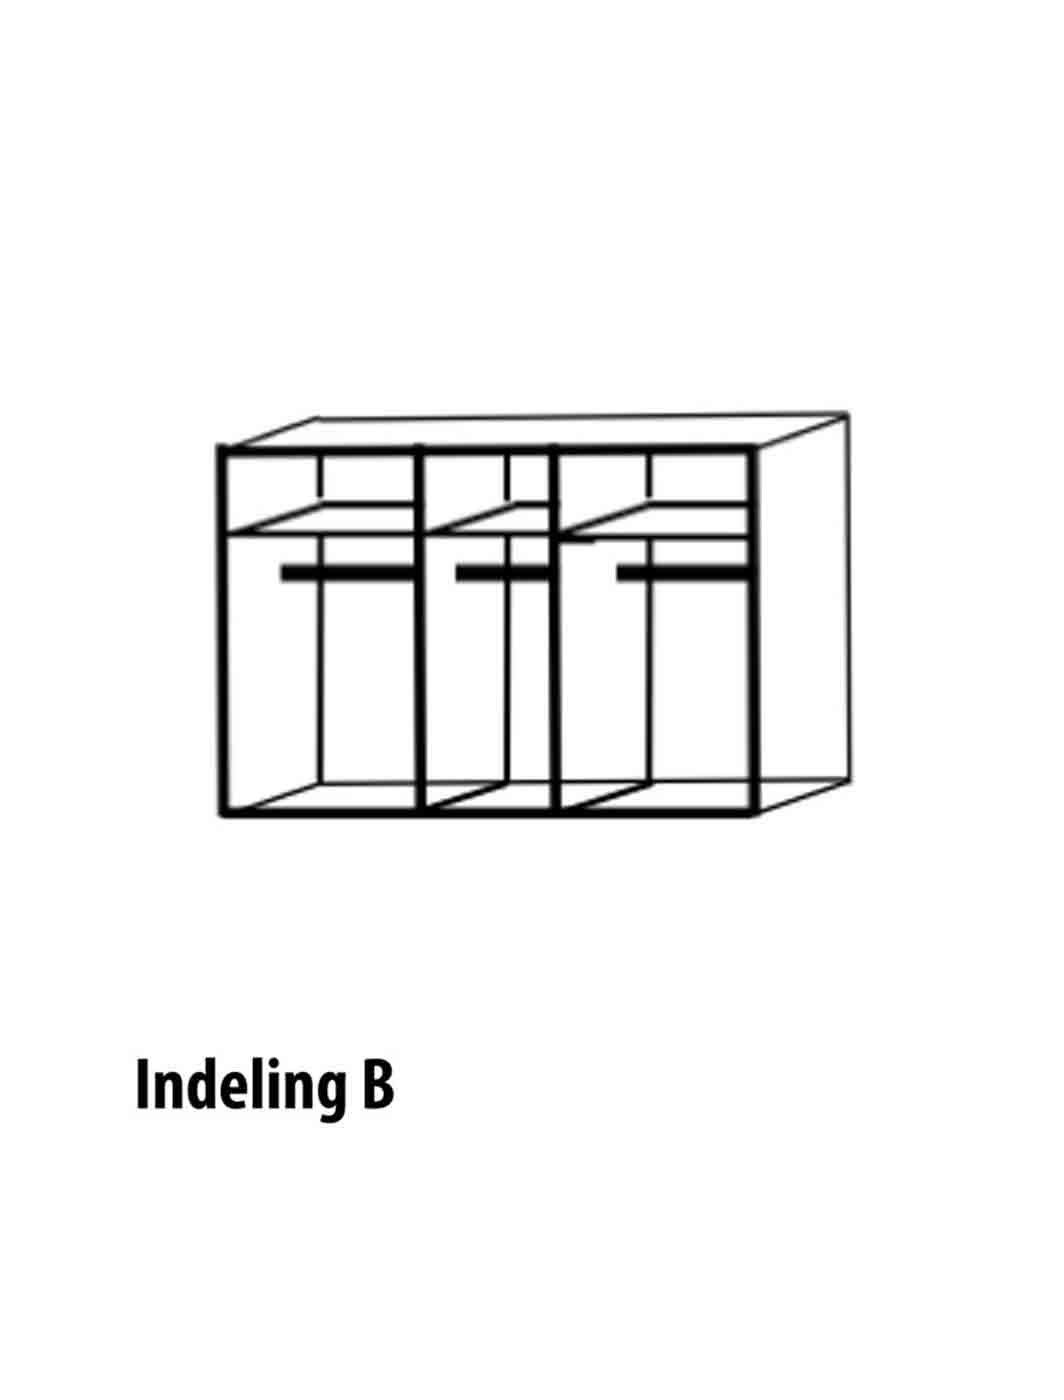 Vijfdeurs-Indeling-B